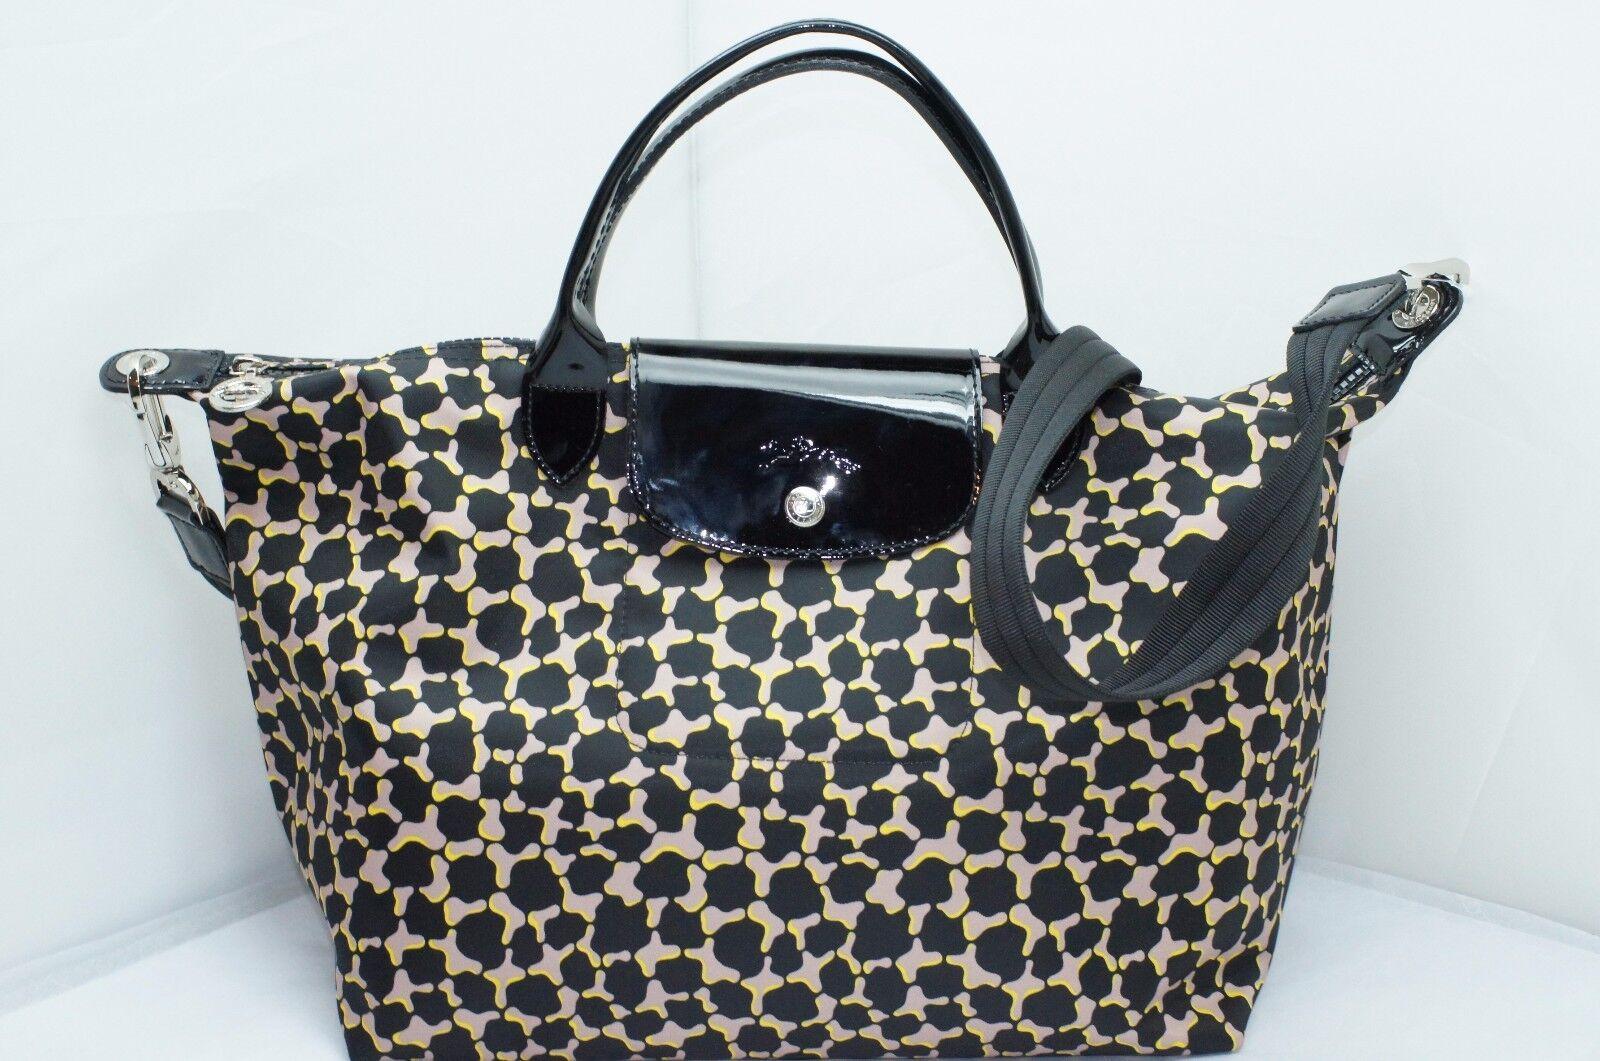 Upc 671194294423 Longchamp Le Pliage Neo Fantaisie Medium Geo Black Authentic Product Image For Fnt Shoulder Tote Bag Handbag